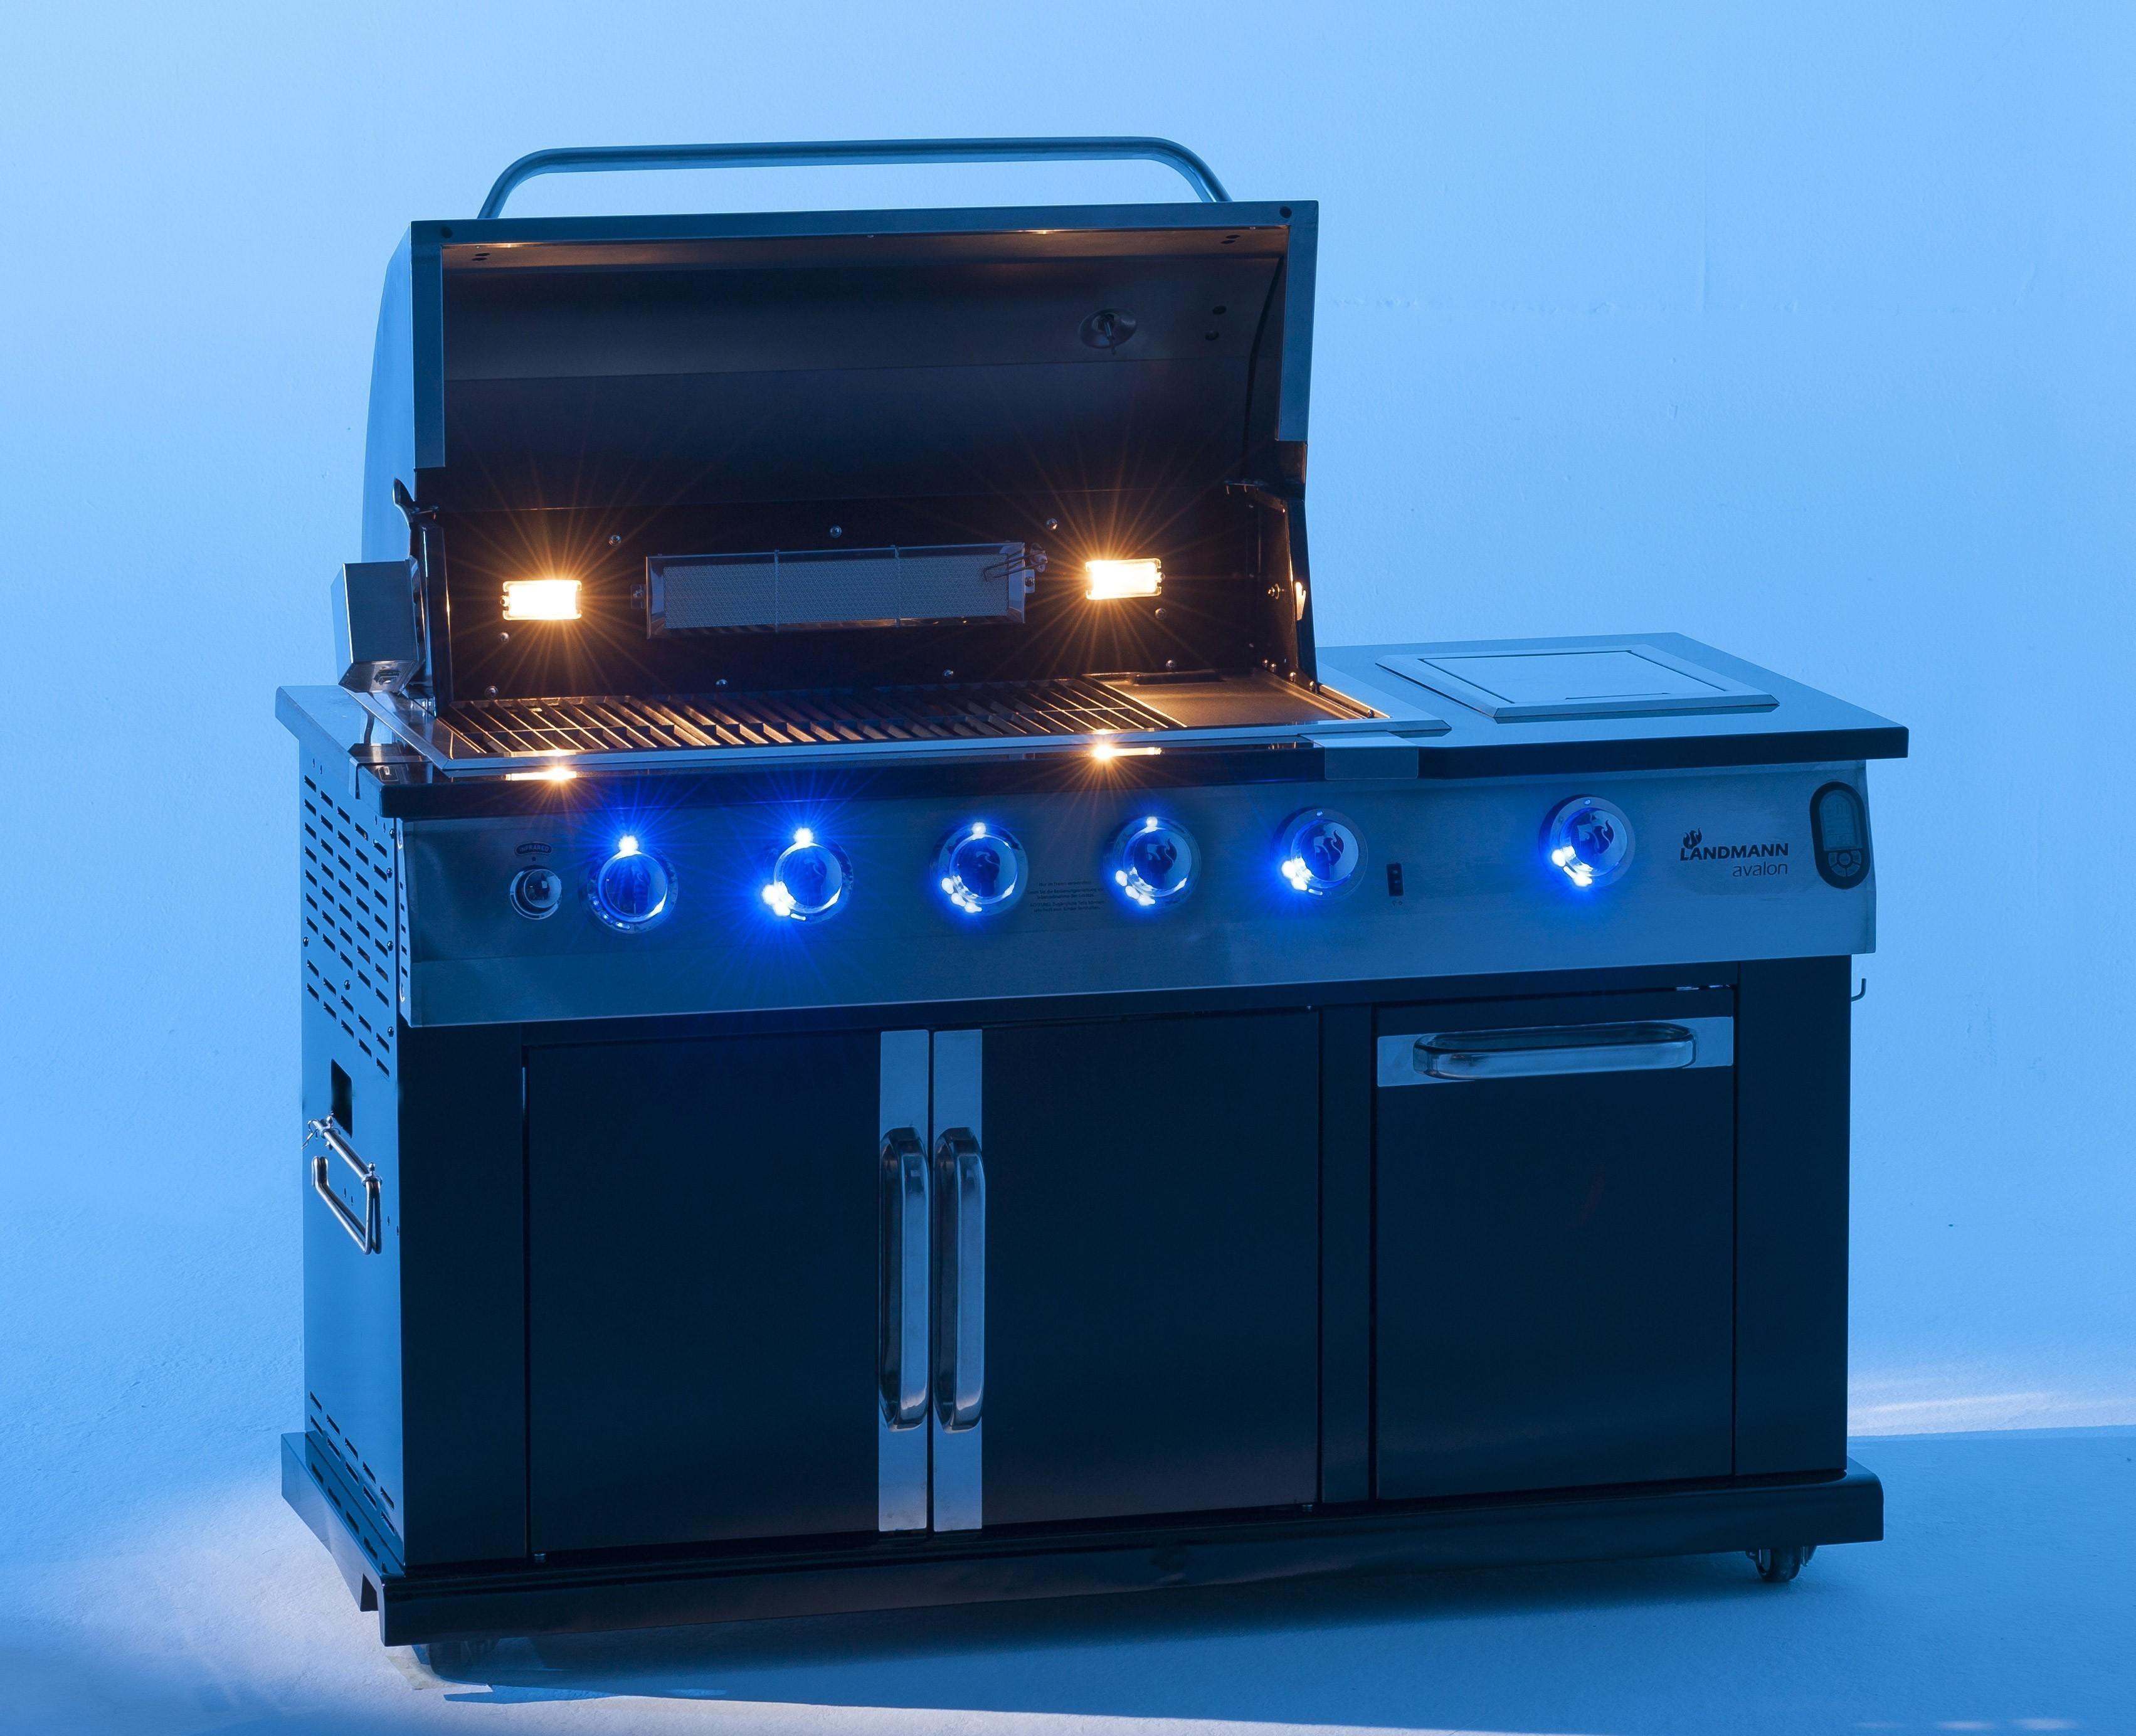 Tchibo Elektrogrill Test : Elektrogrill anleitung ersatzteile: landmann avalon pts 6 1 test